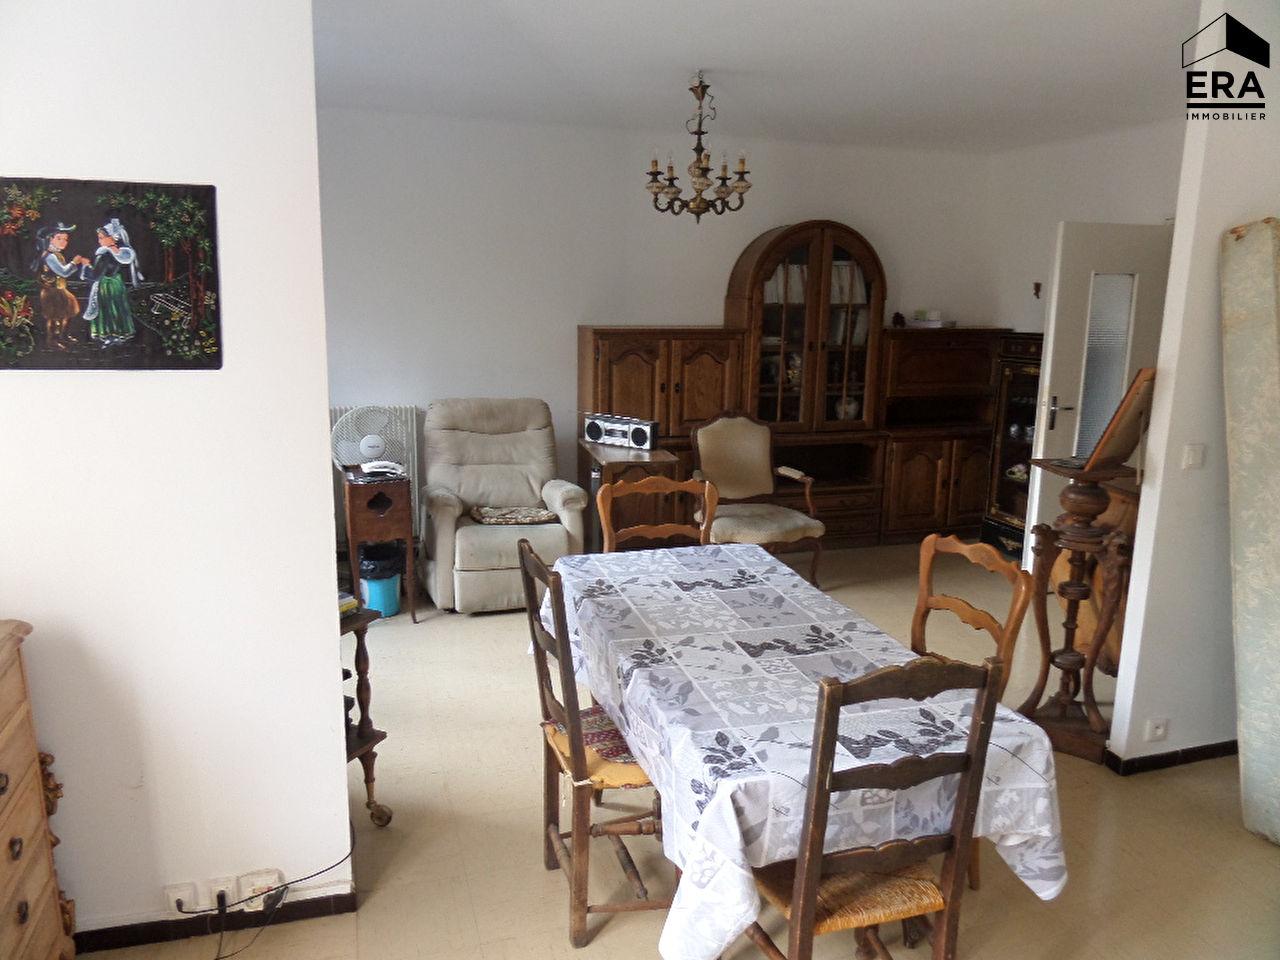 t3 4 garage cave aix en provence centre ville pied aix en provence 13080. Black Bedroom Furniture Sets. Home Design Ideas